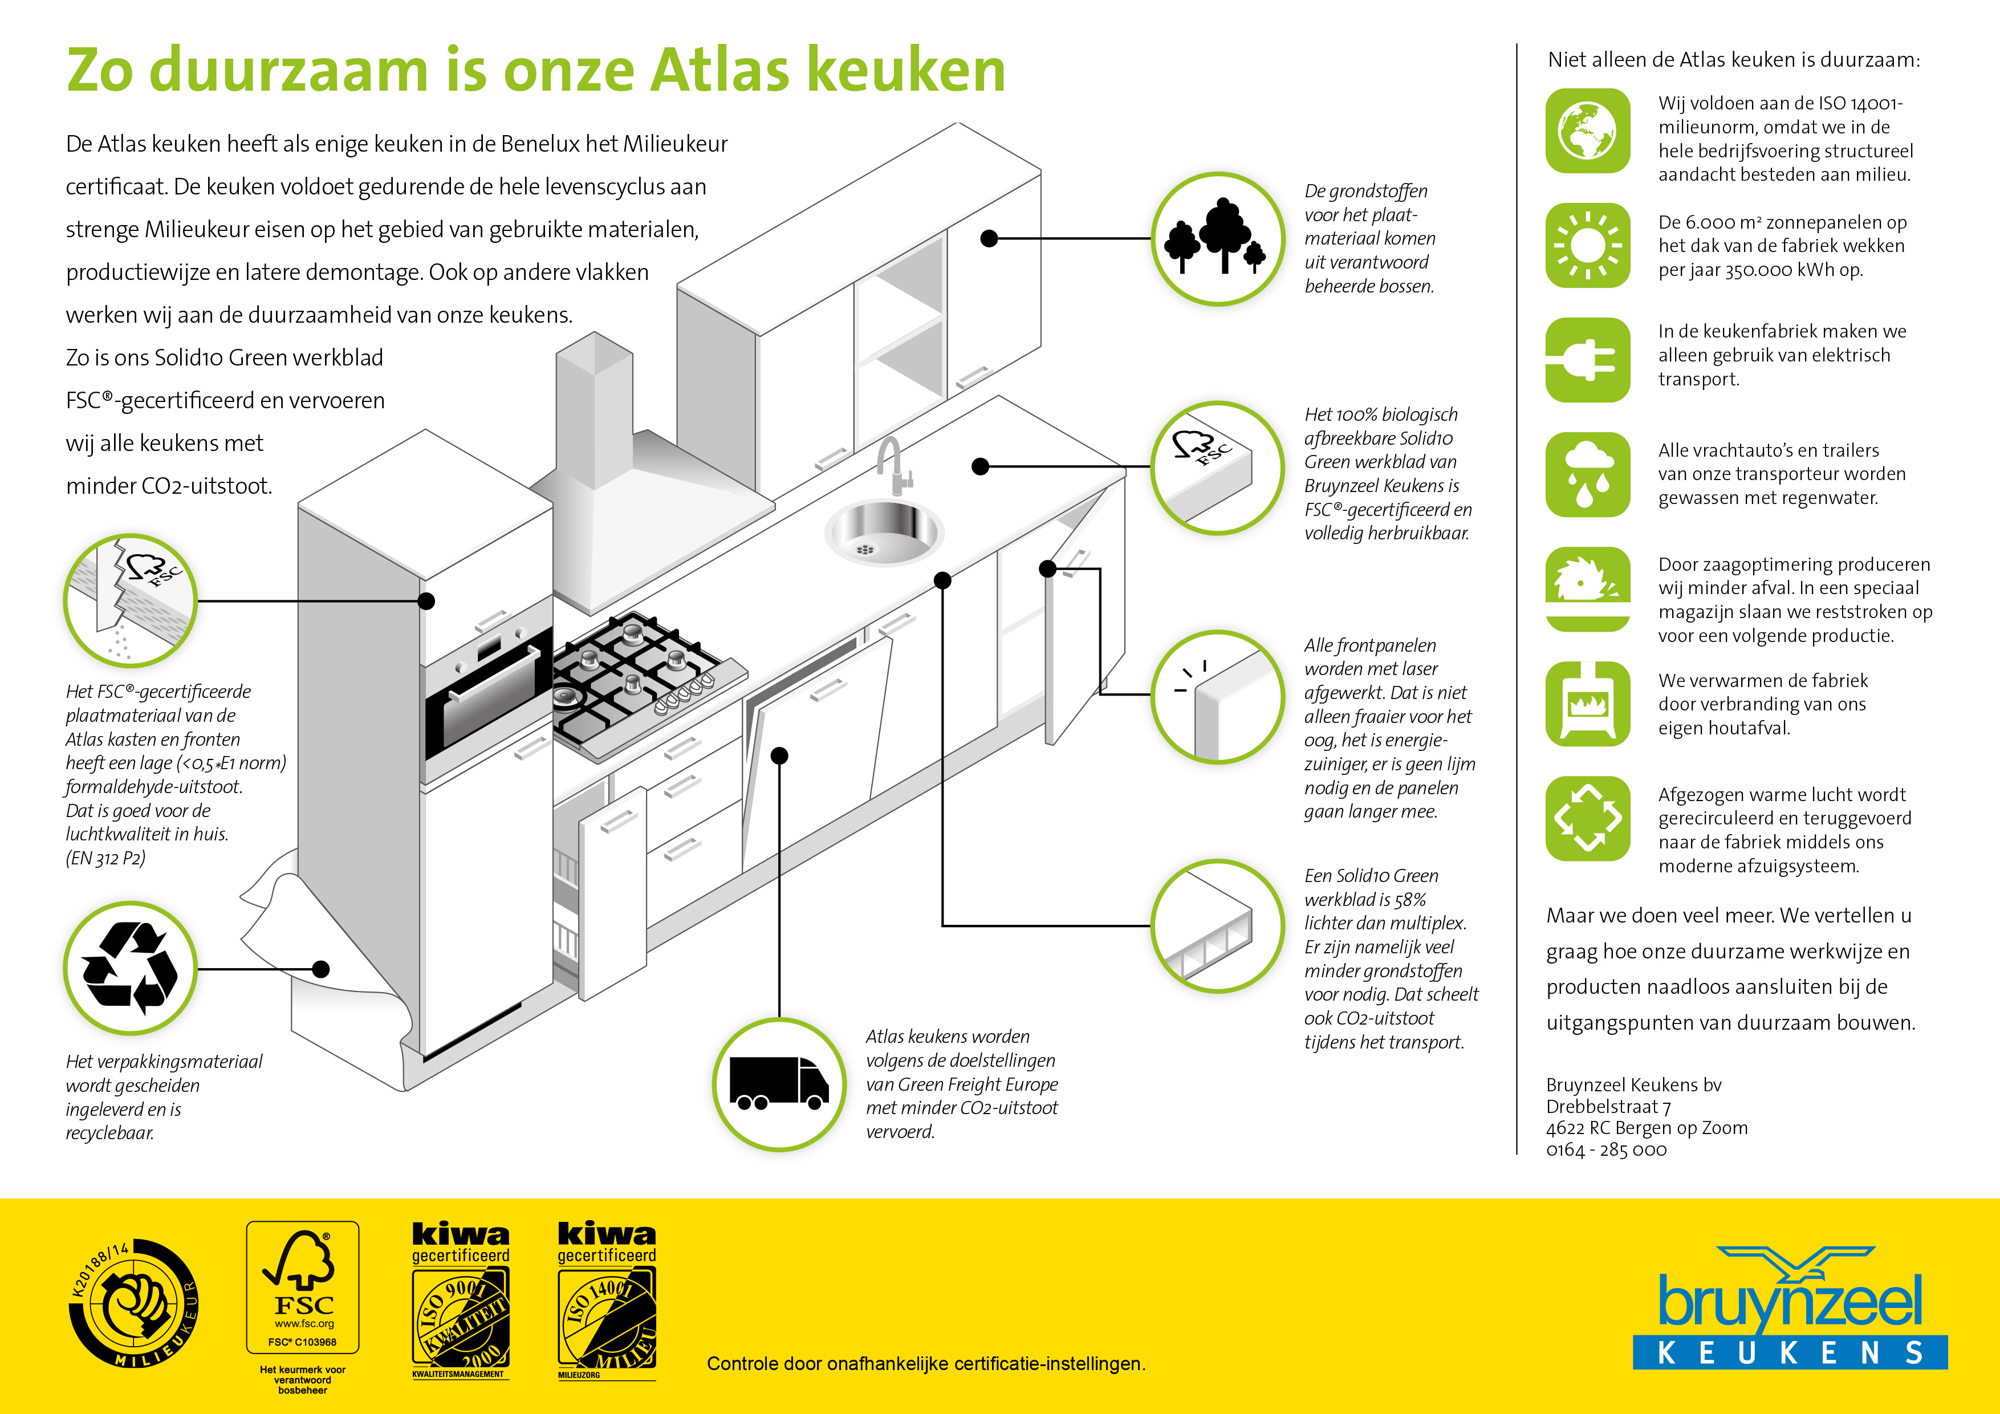 550415015 Infographic A4 Bruynzeel duurzame ATLAS keuken-iso